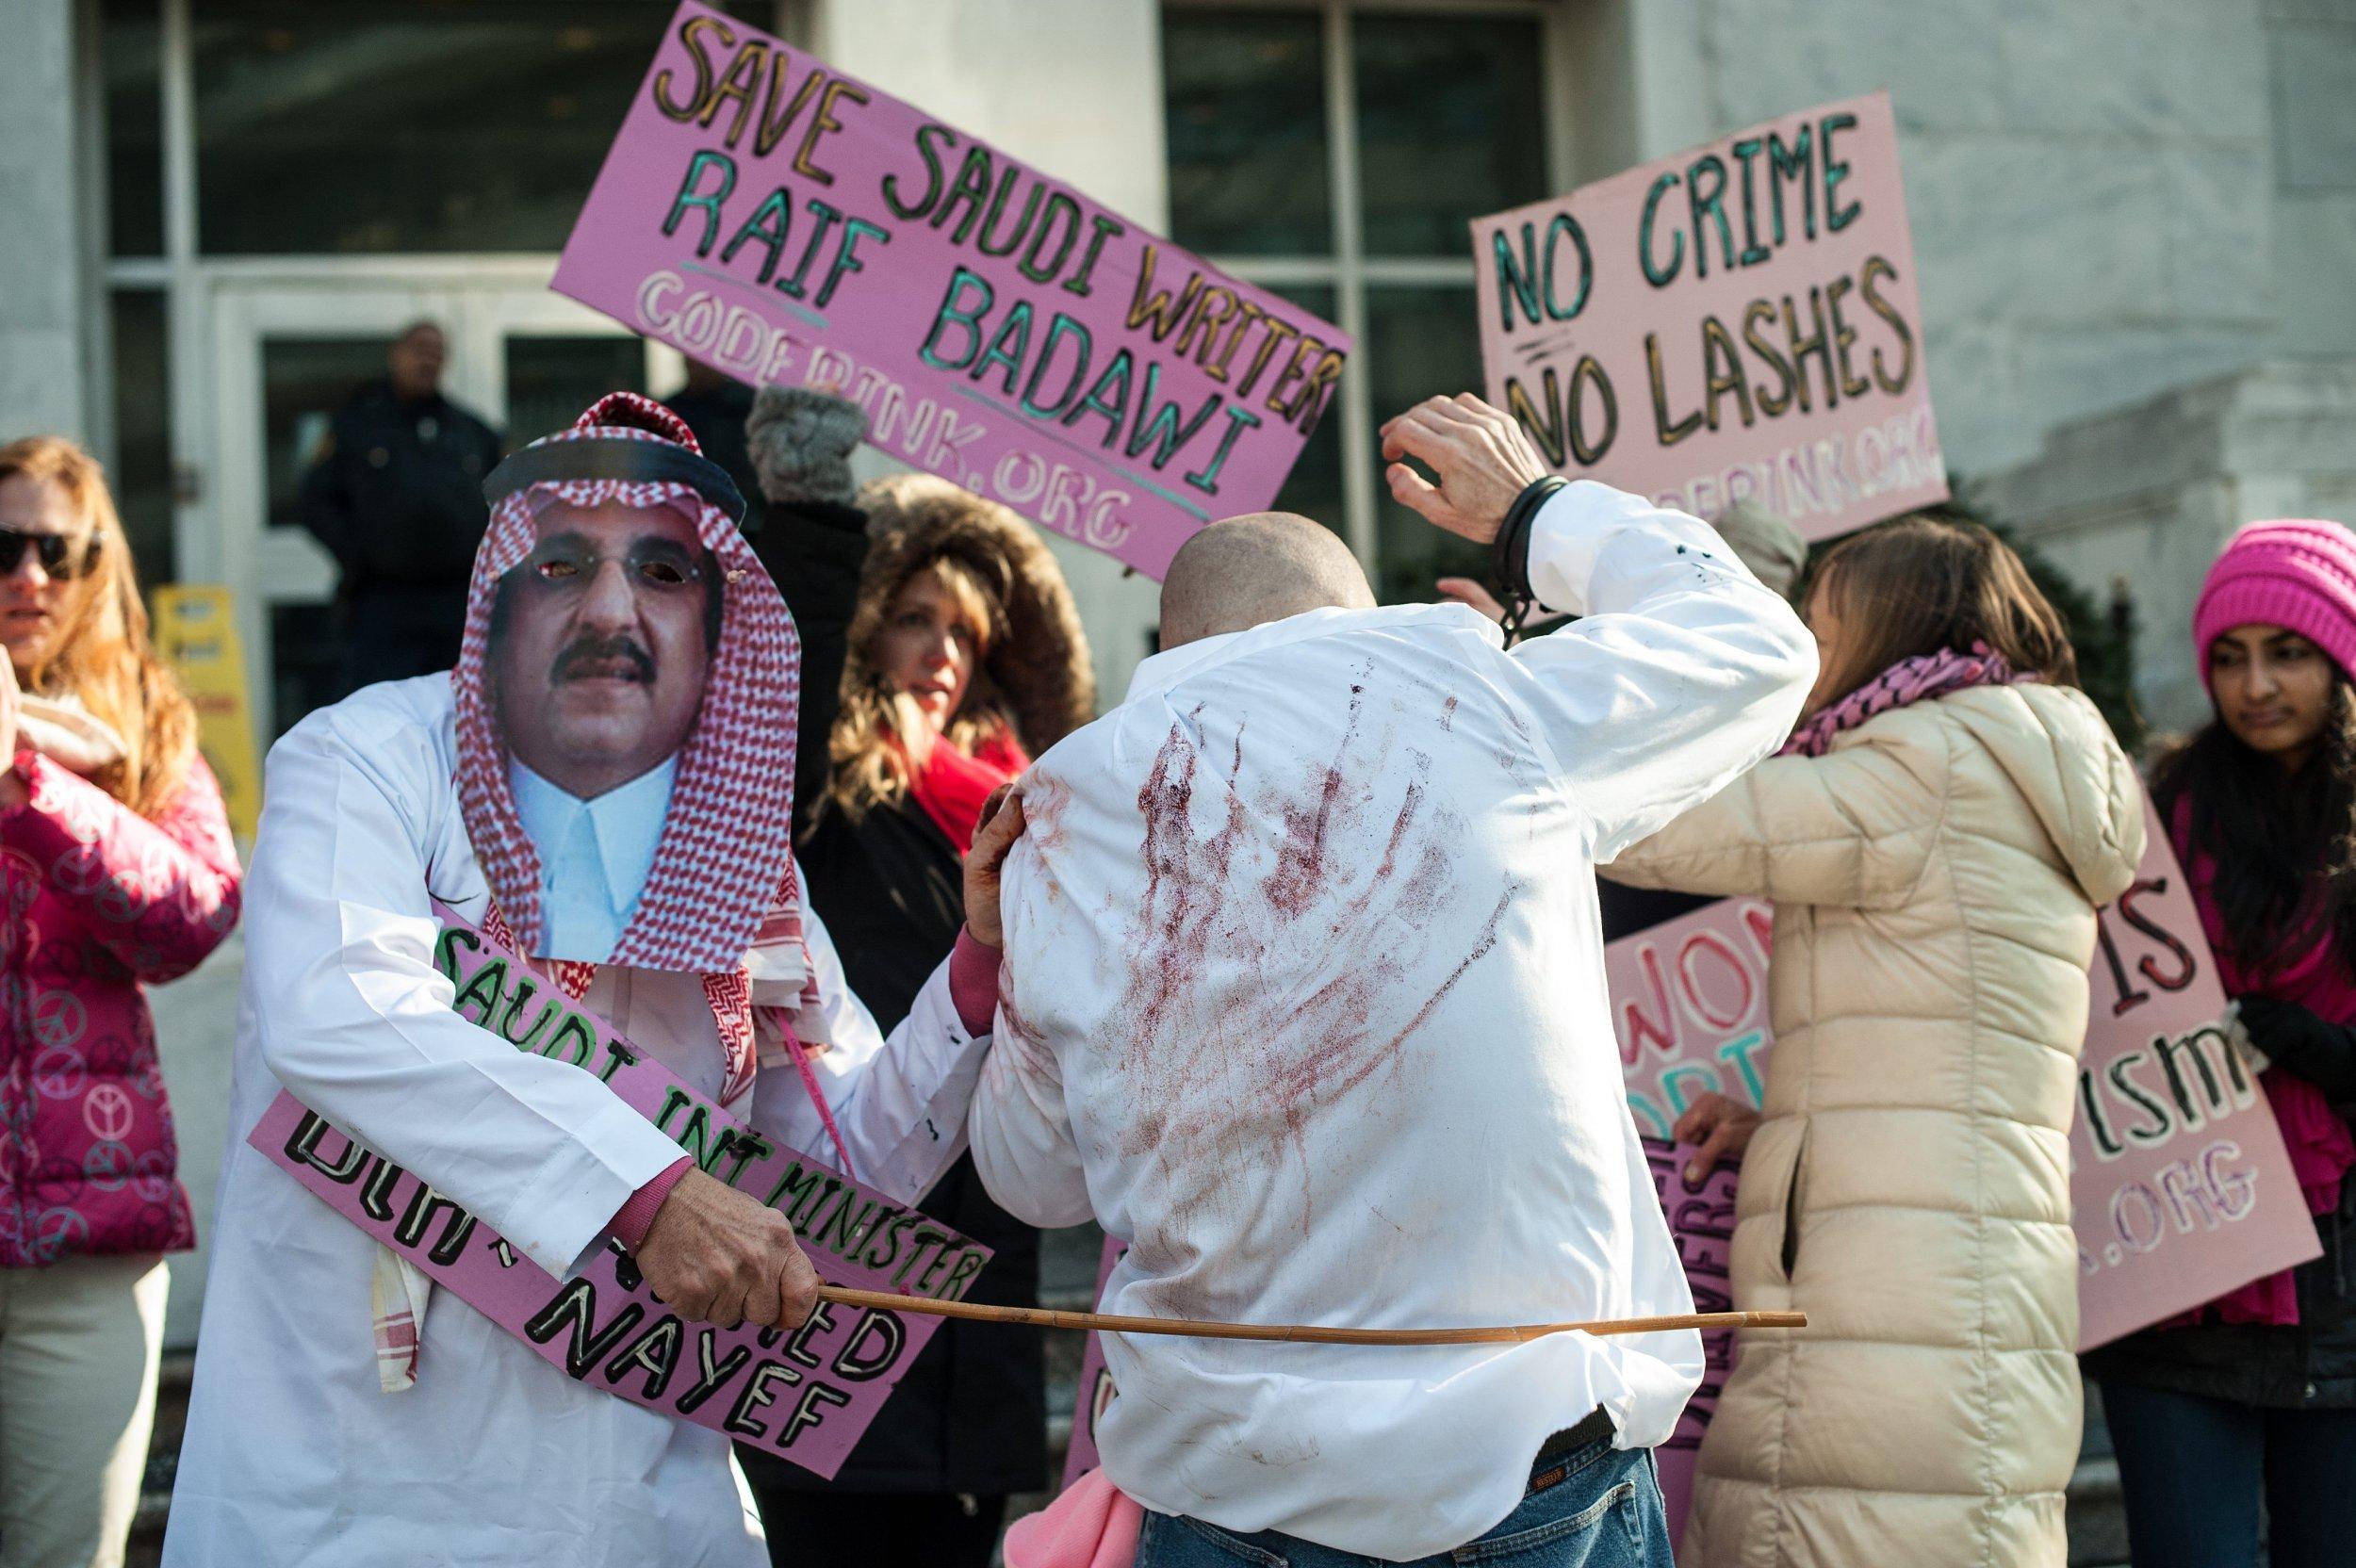 Congratulate, your lashes saudi arabia girls recommend you